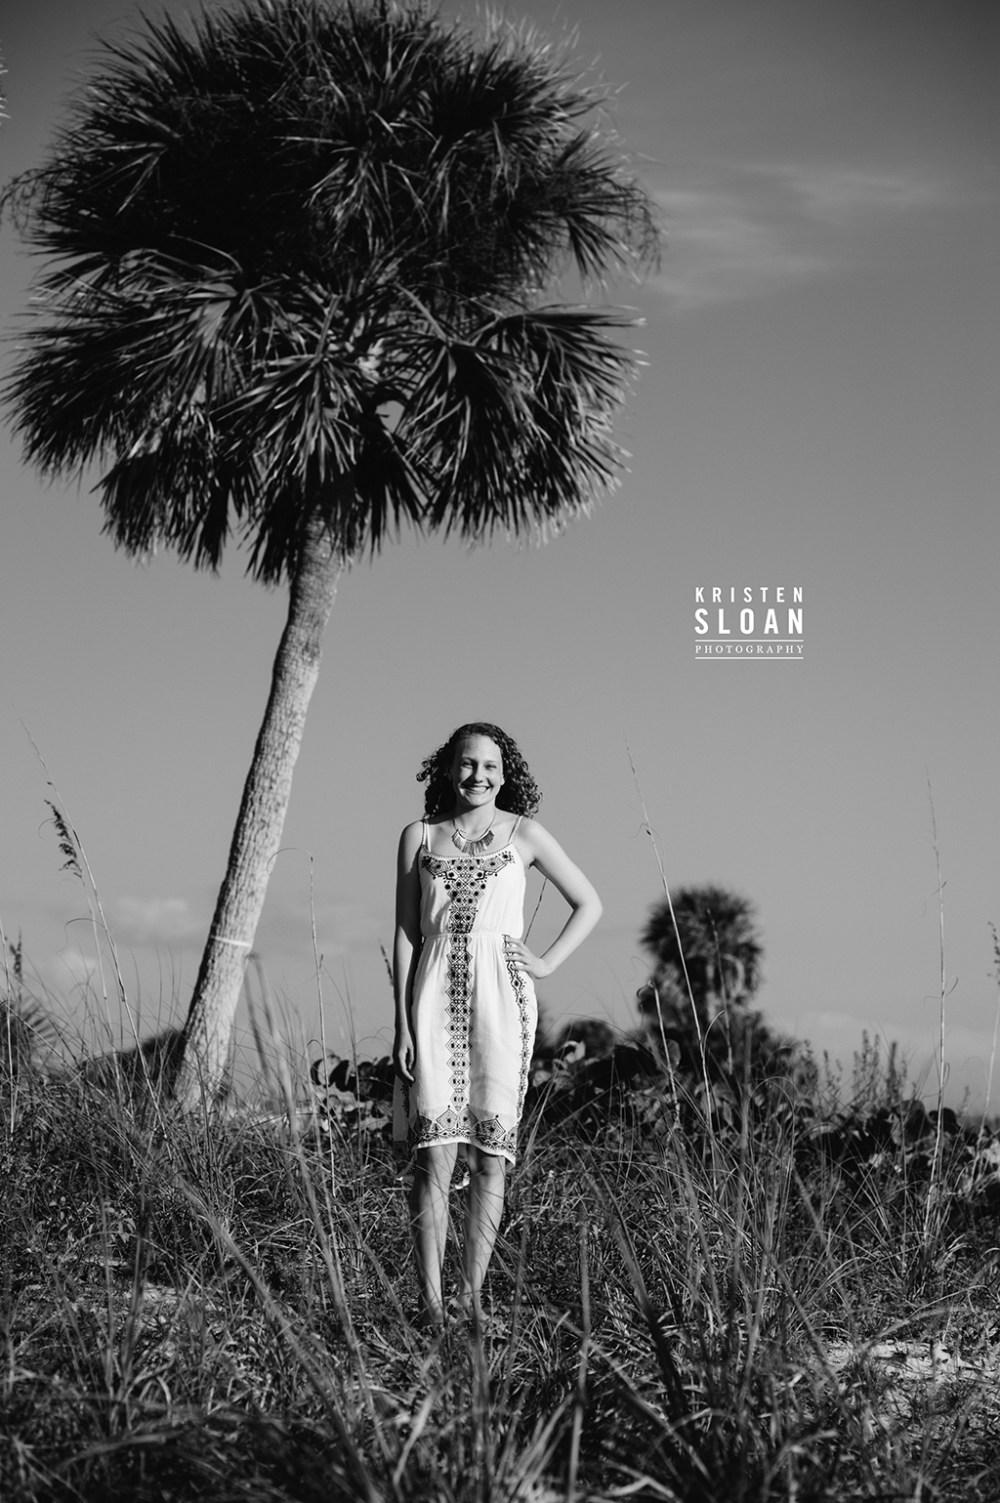 St Pete Beach Portrait Wedding Photographer |Tradewinds Island Resort Photographer | Treasure Island FL Beach Photos |Treasure Island Wedding Portrait Photographer